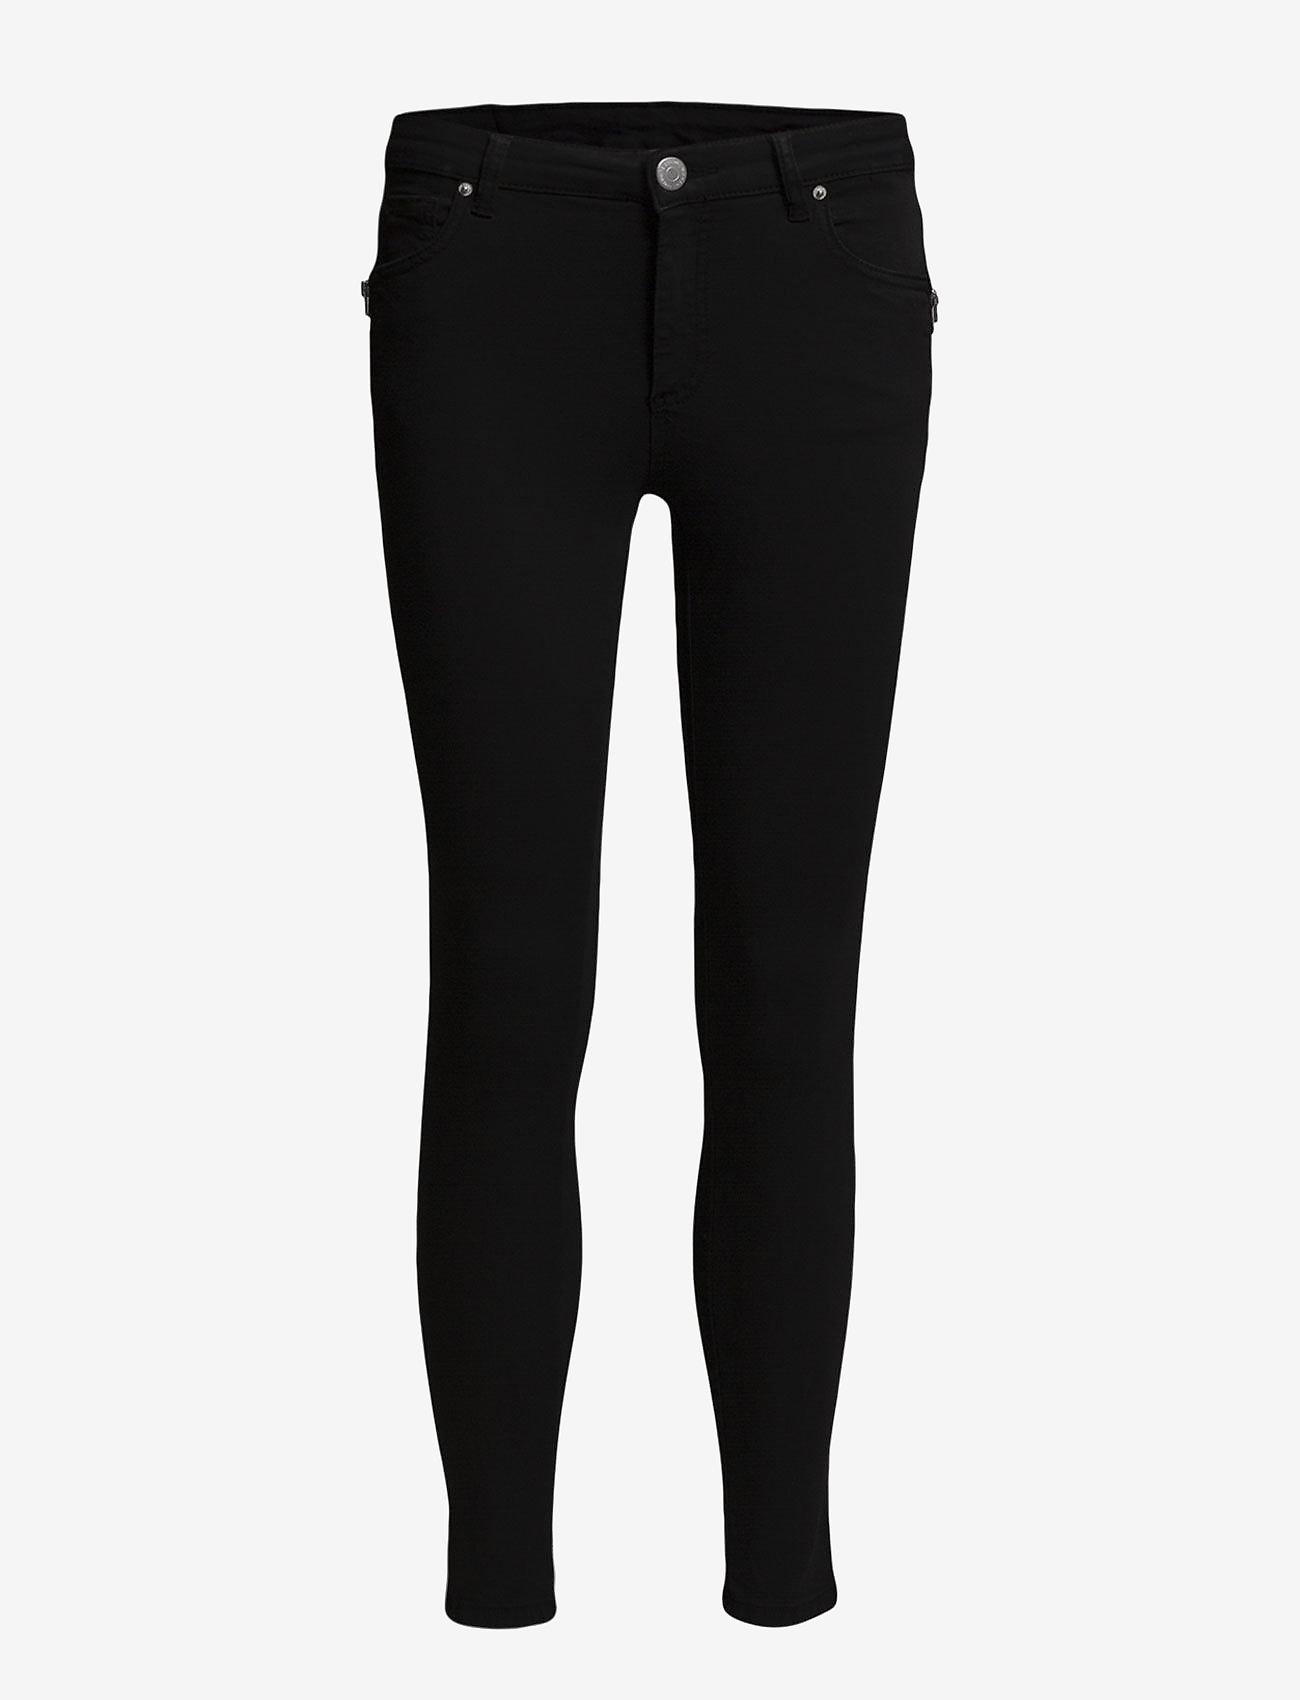 FIVEUNITS - Penelope 266 Zip, Black Line, Jeans - dżinsy skinny fit - black line - 1